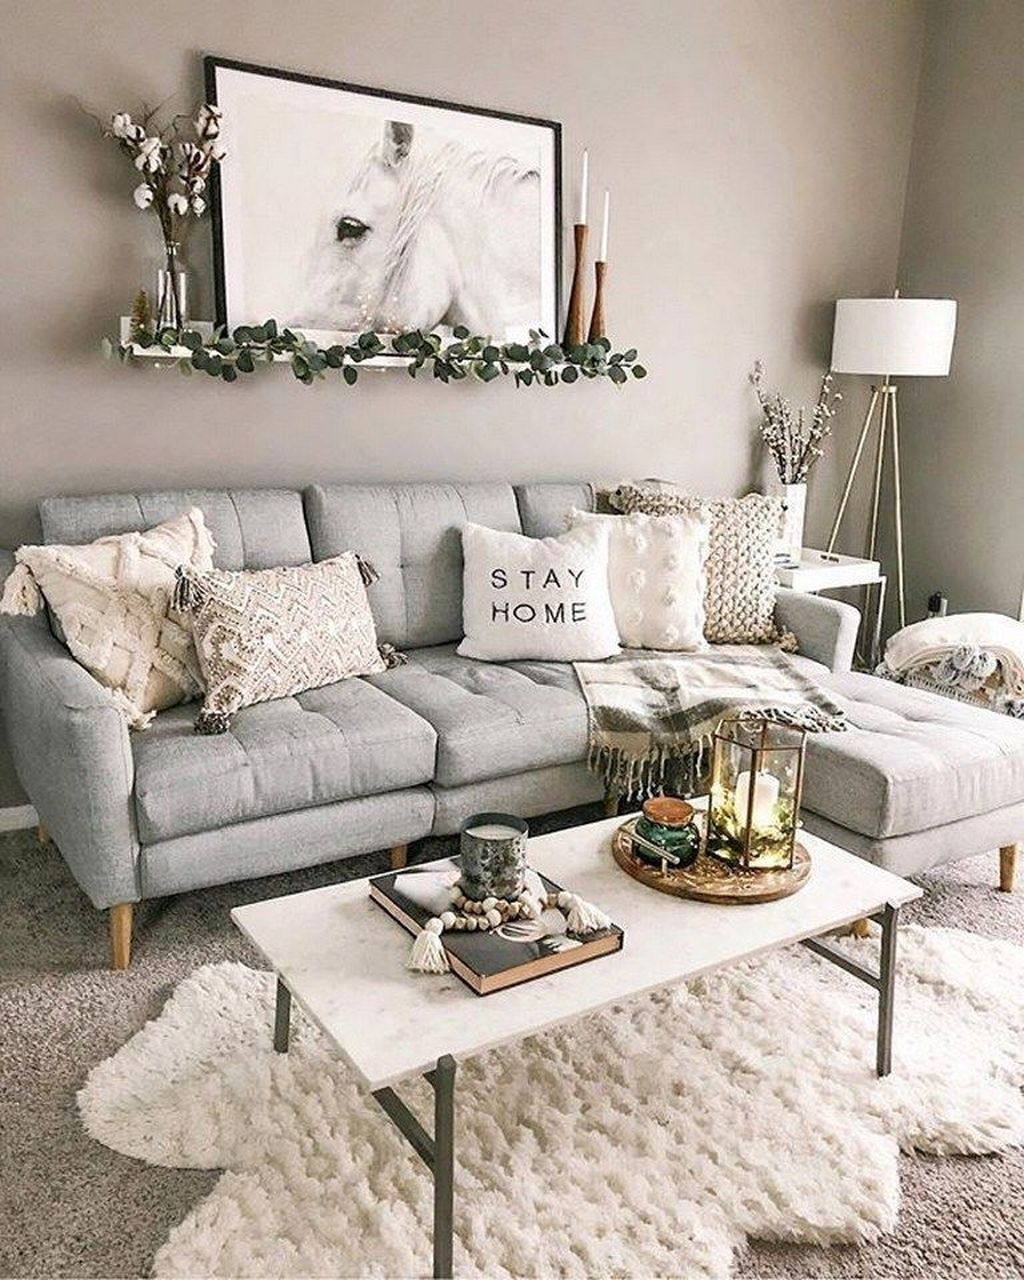 40 Amazing Minimalist Living Room Design Ideas To Try Li